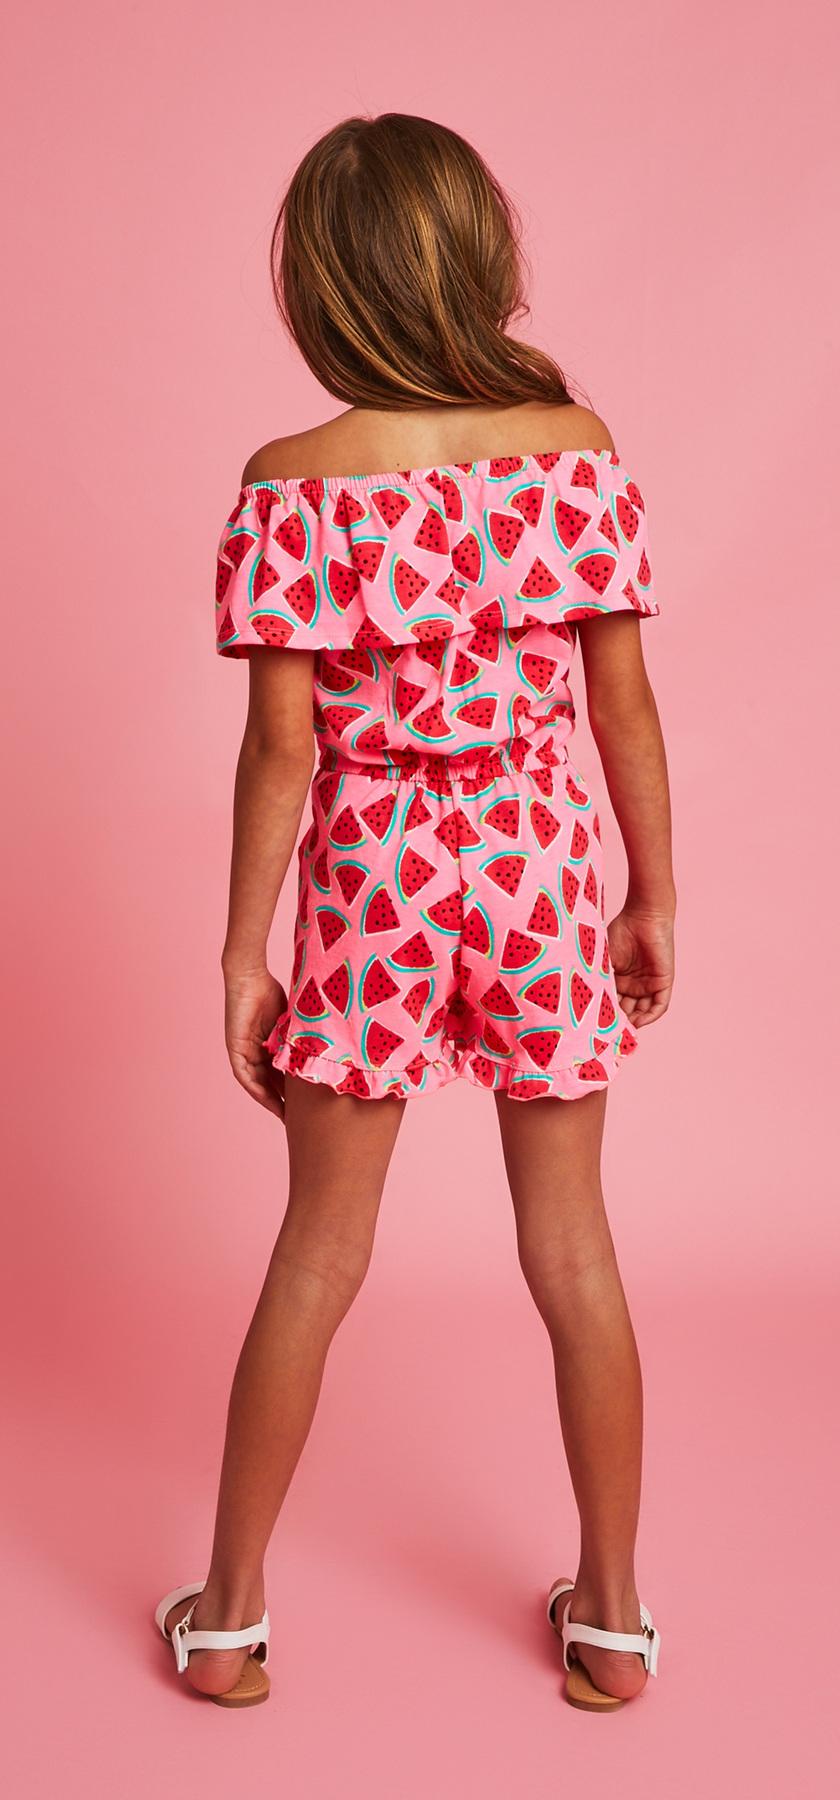 3d2c2e3adba Watermelon Off The Shoulder Ruffle Romper Outfit - FabKids